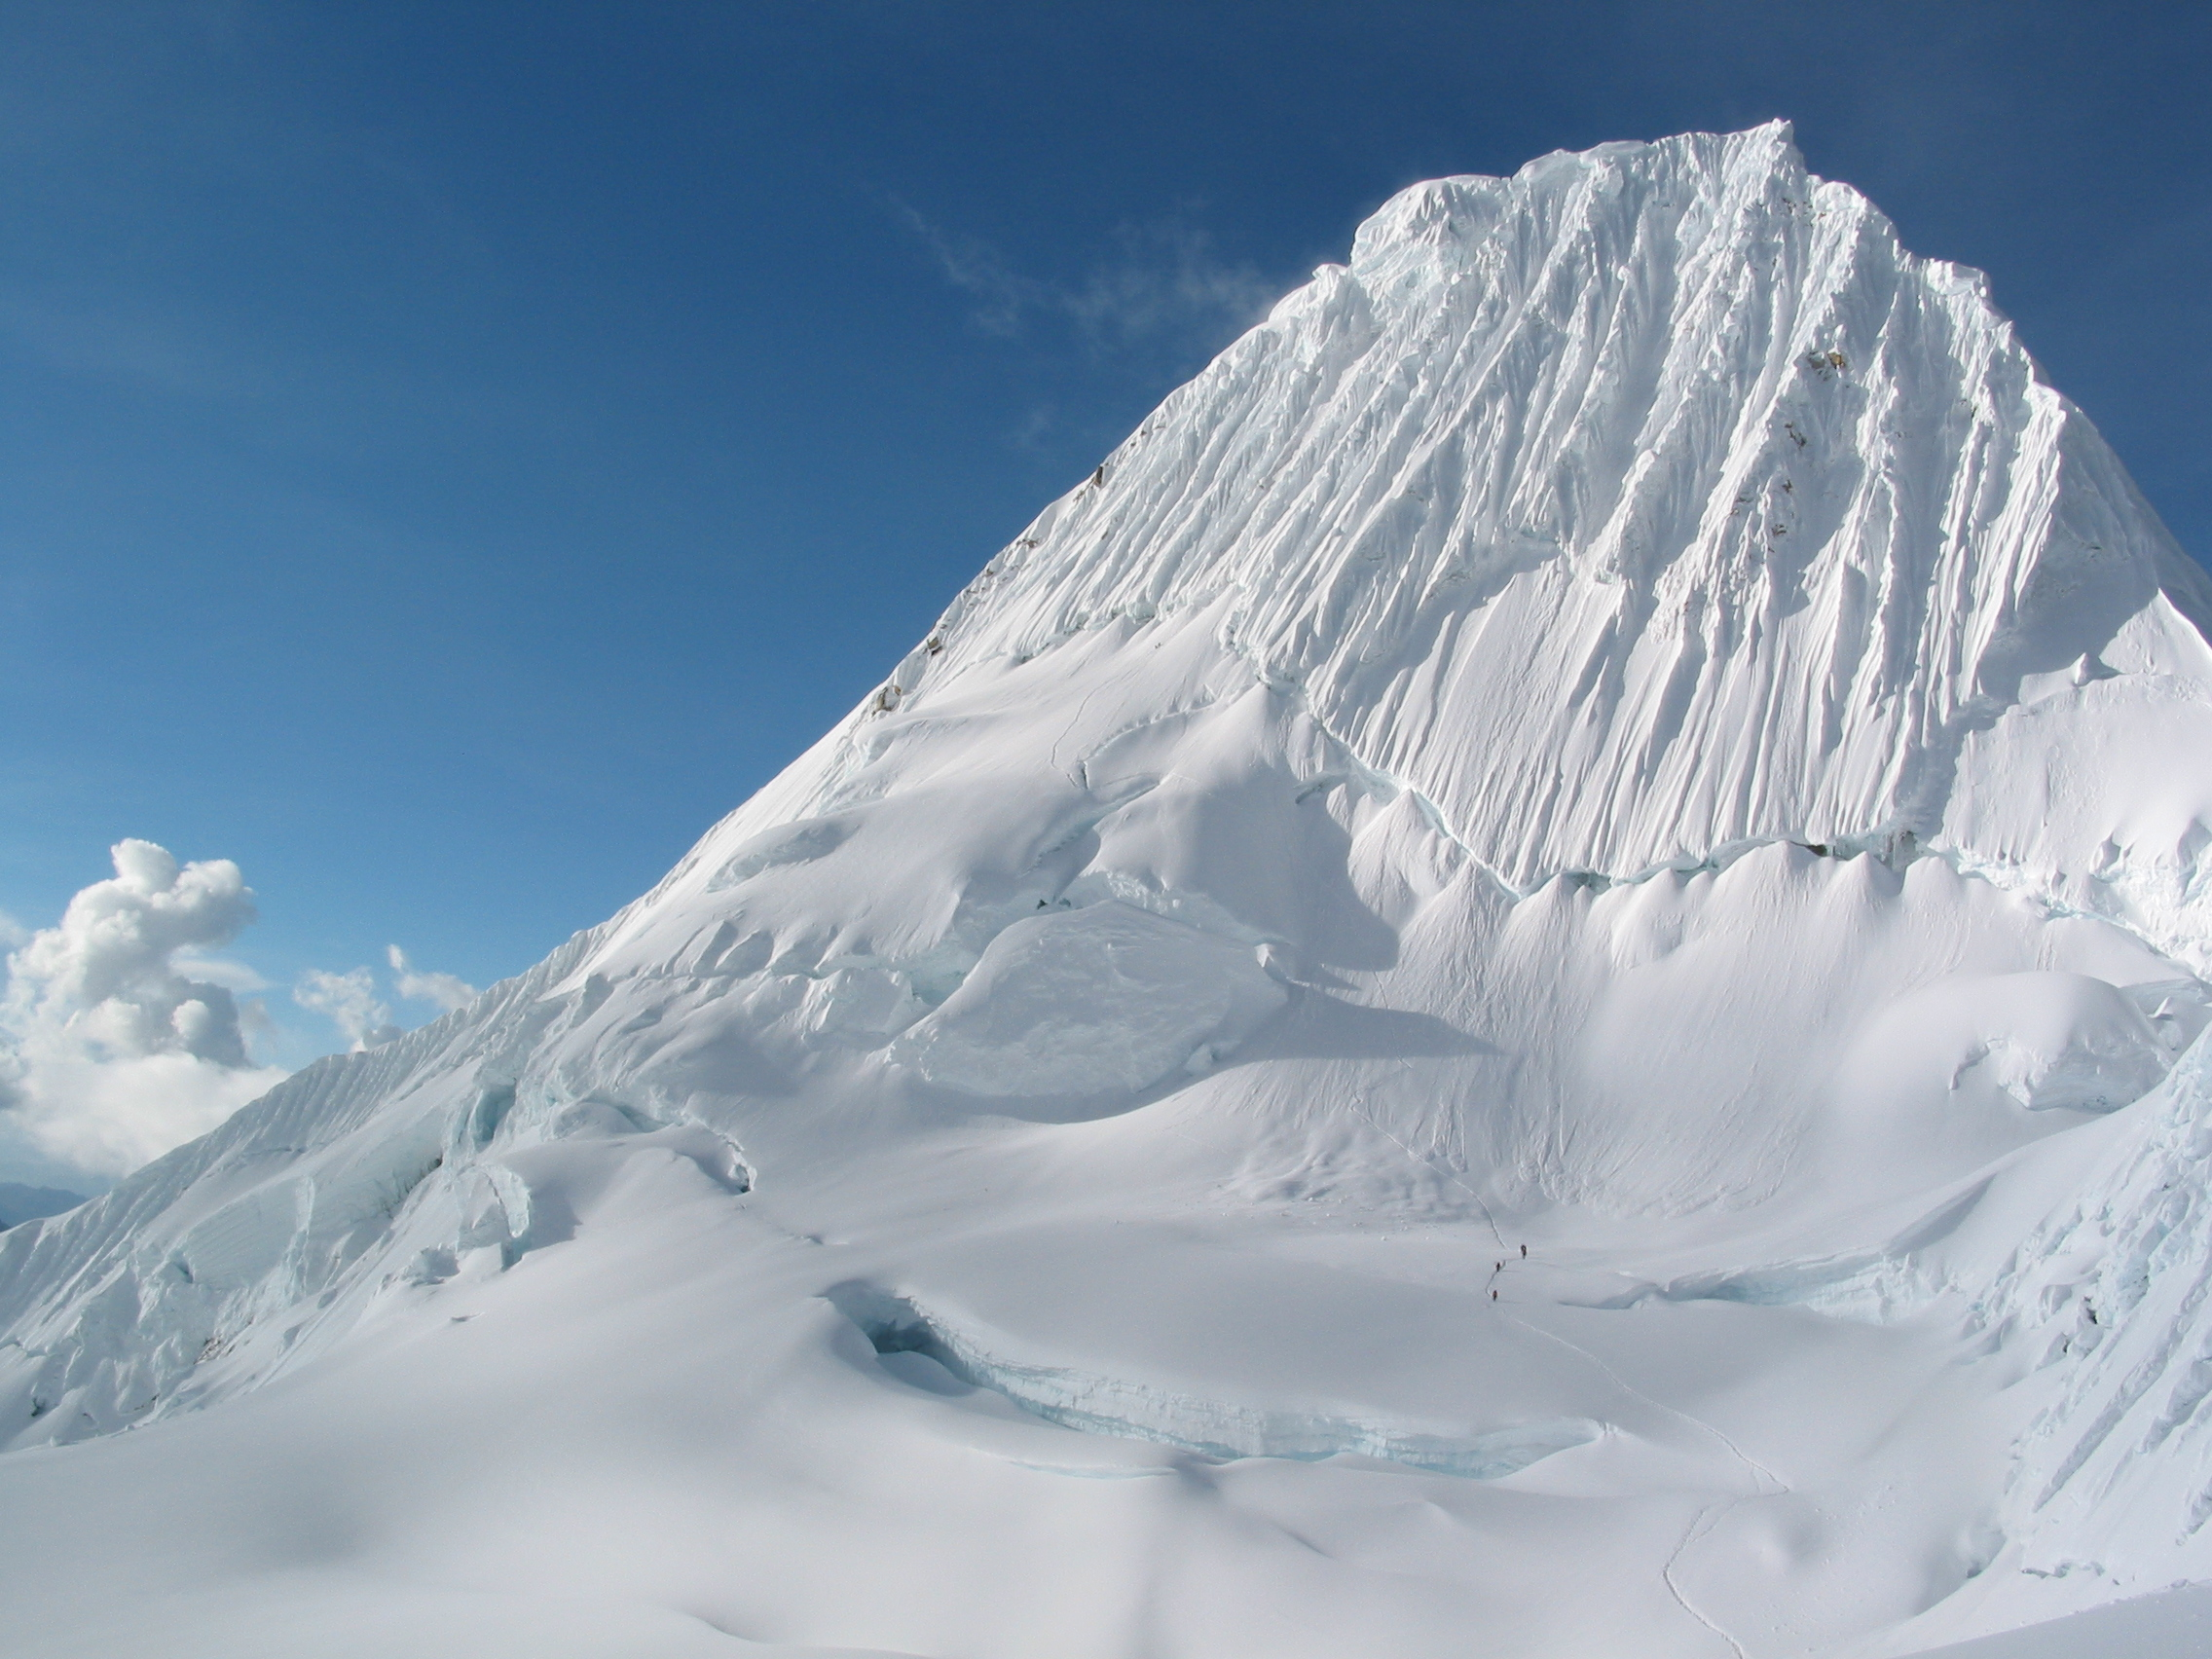 Alpamayo - a very nice representative of Peruvian Andes mountains